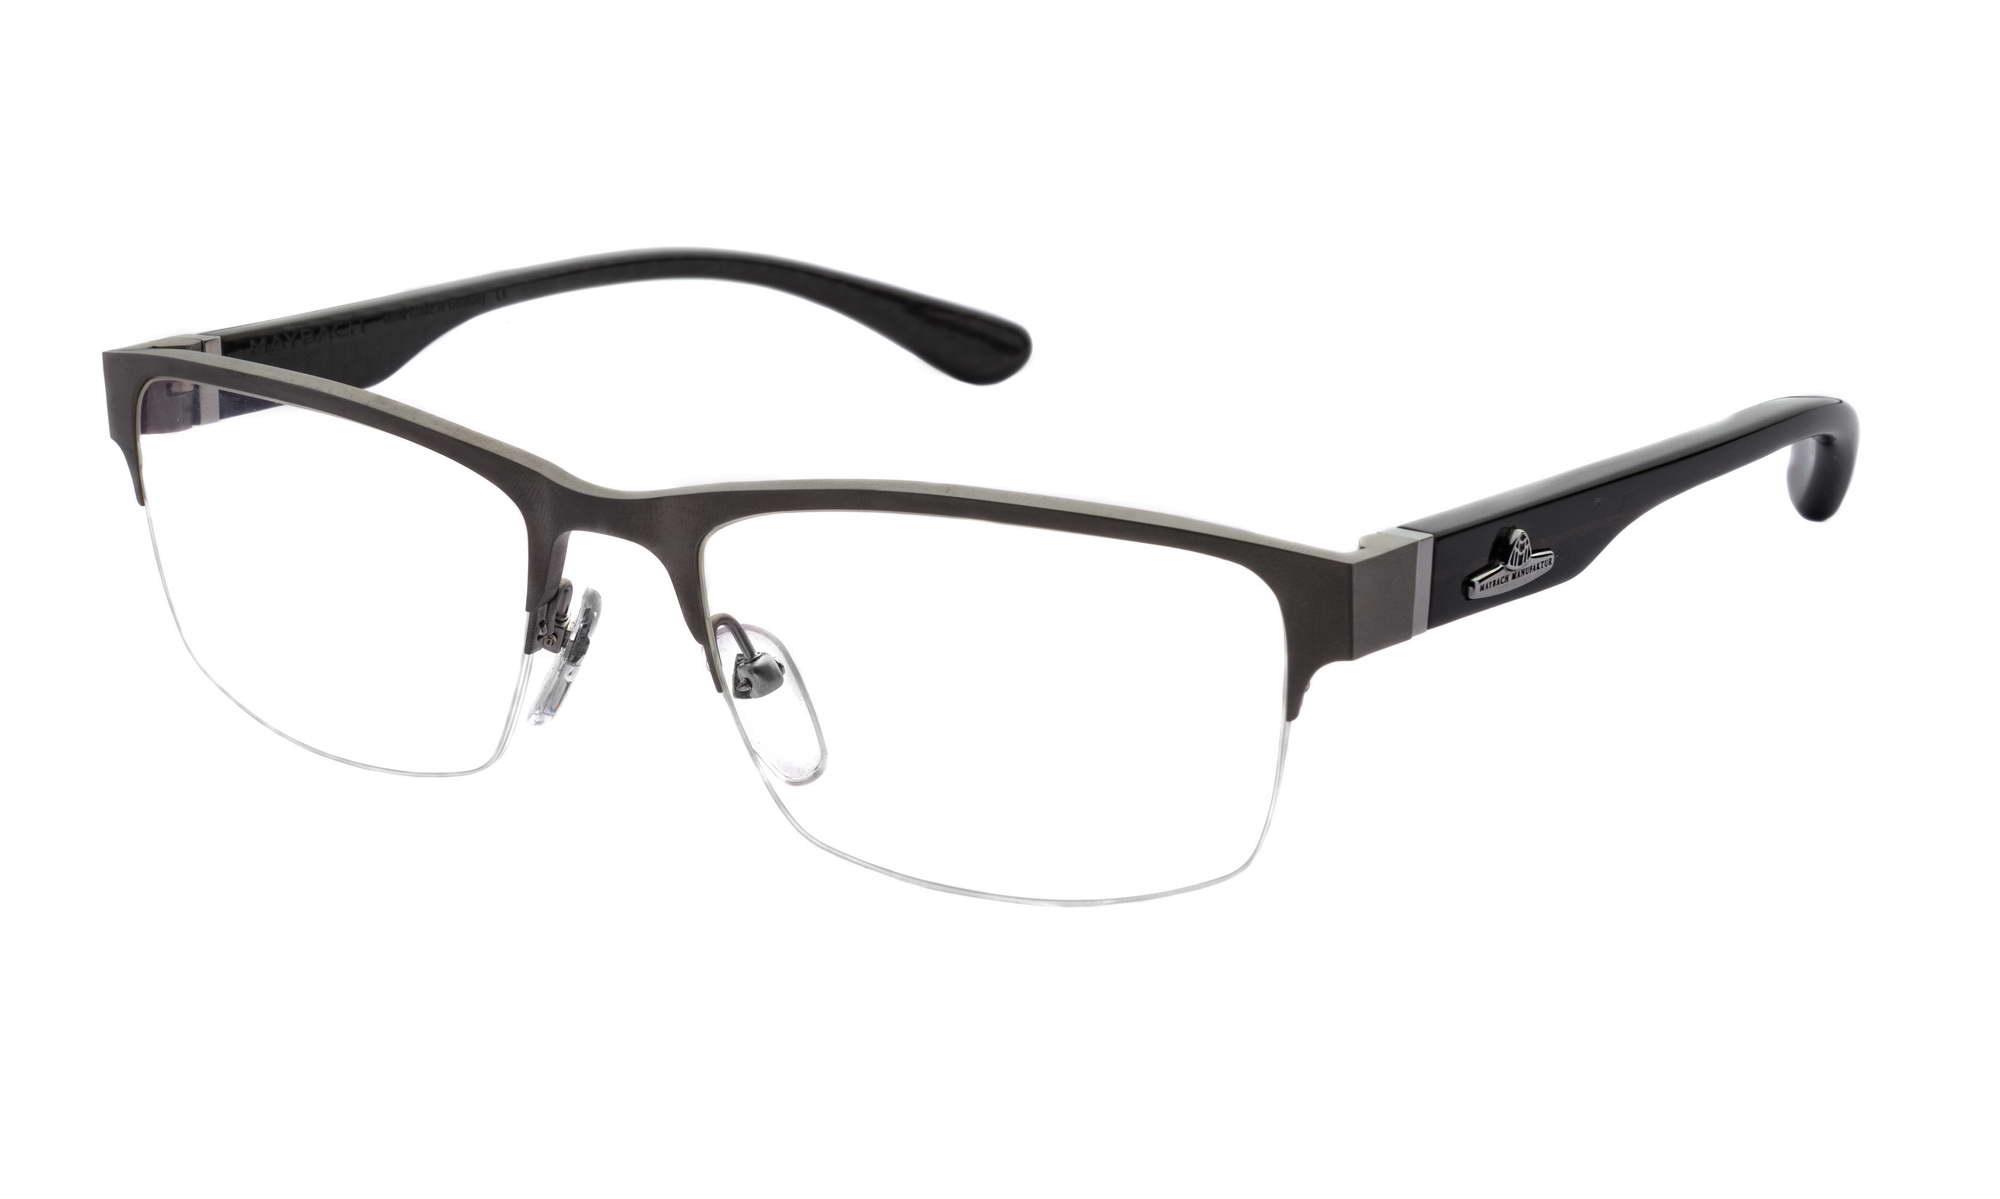 Maybach M1804 мужские оптические оправы для очков в салоне бинооптика